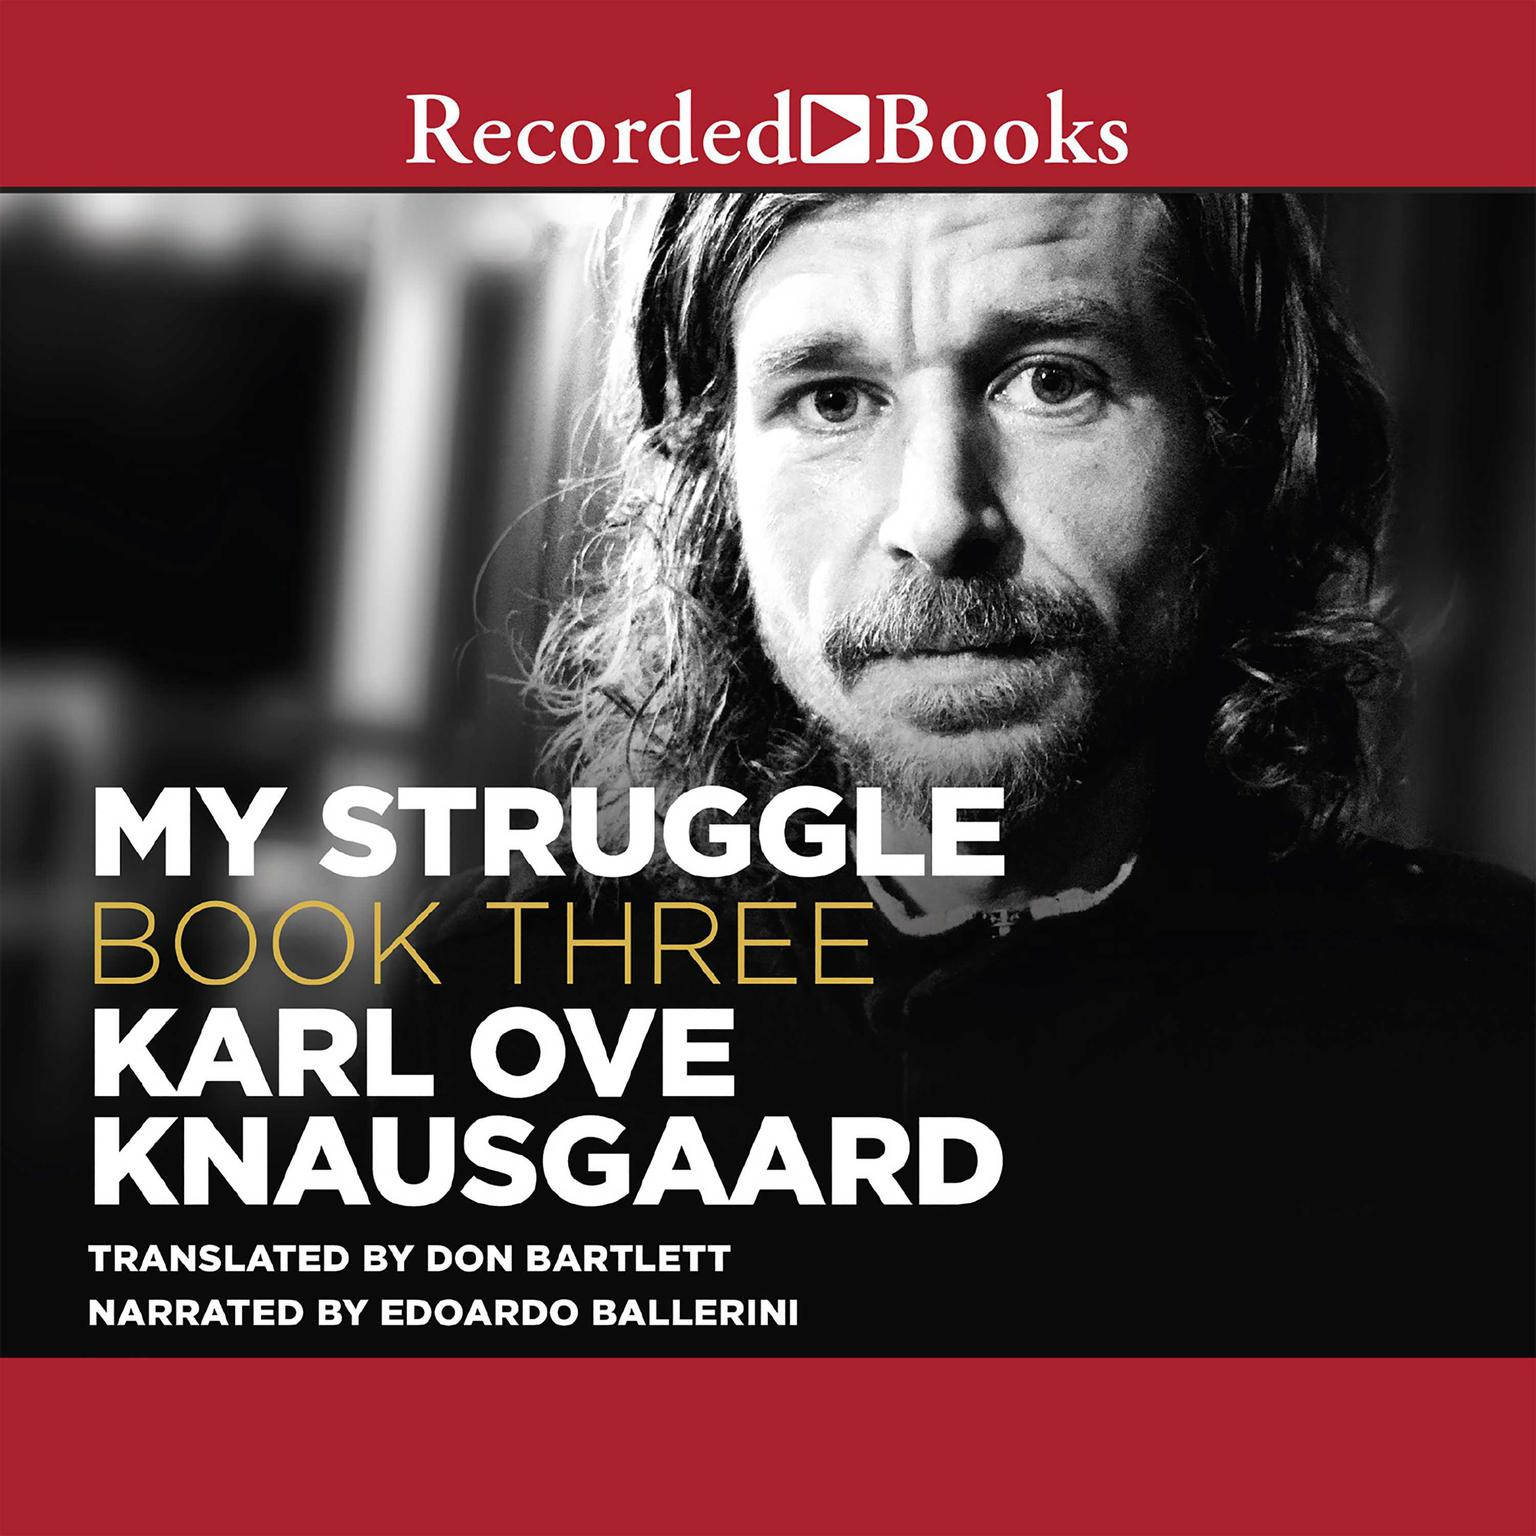 My Struggle, Book 3 Audiobook, by Karl Ove Knausgaard